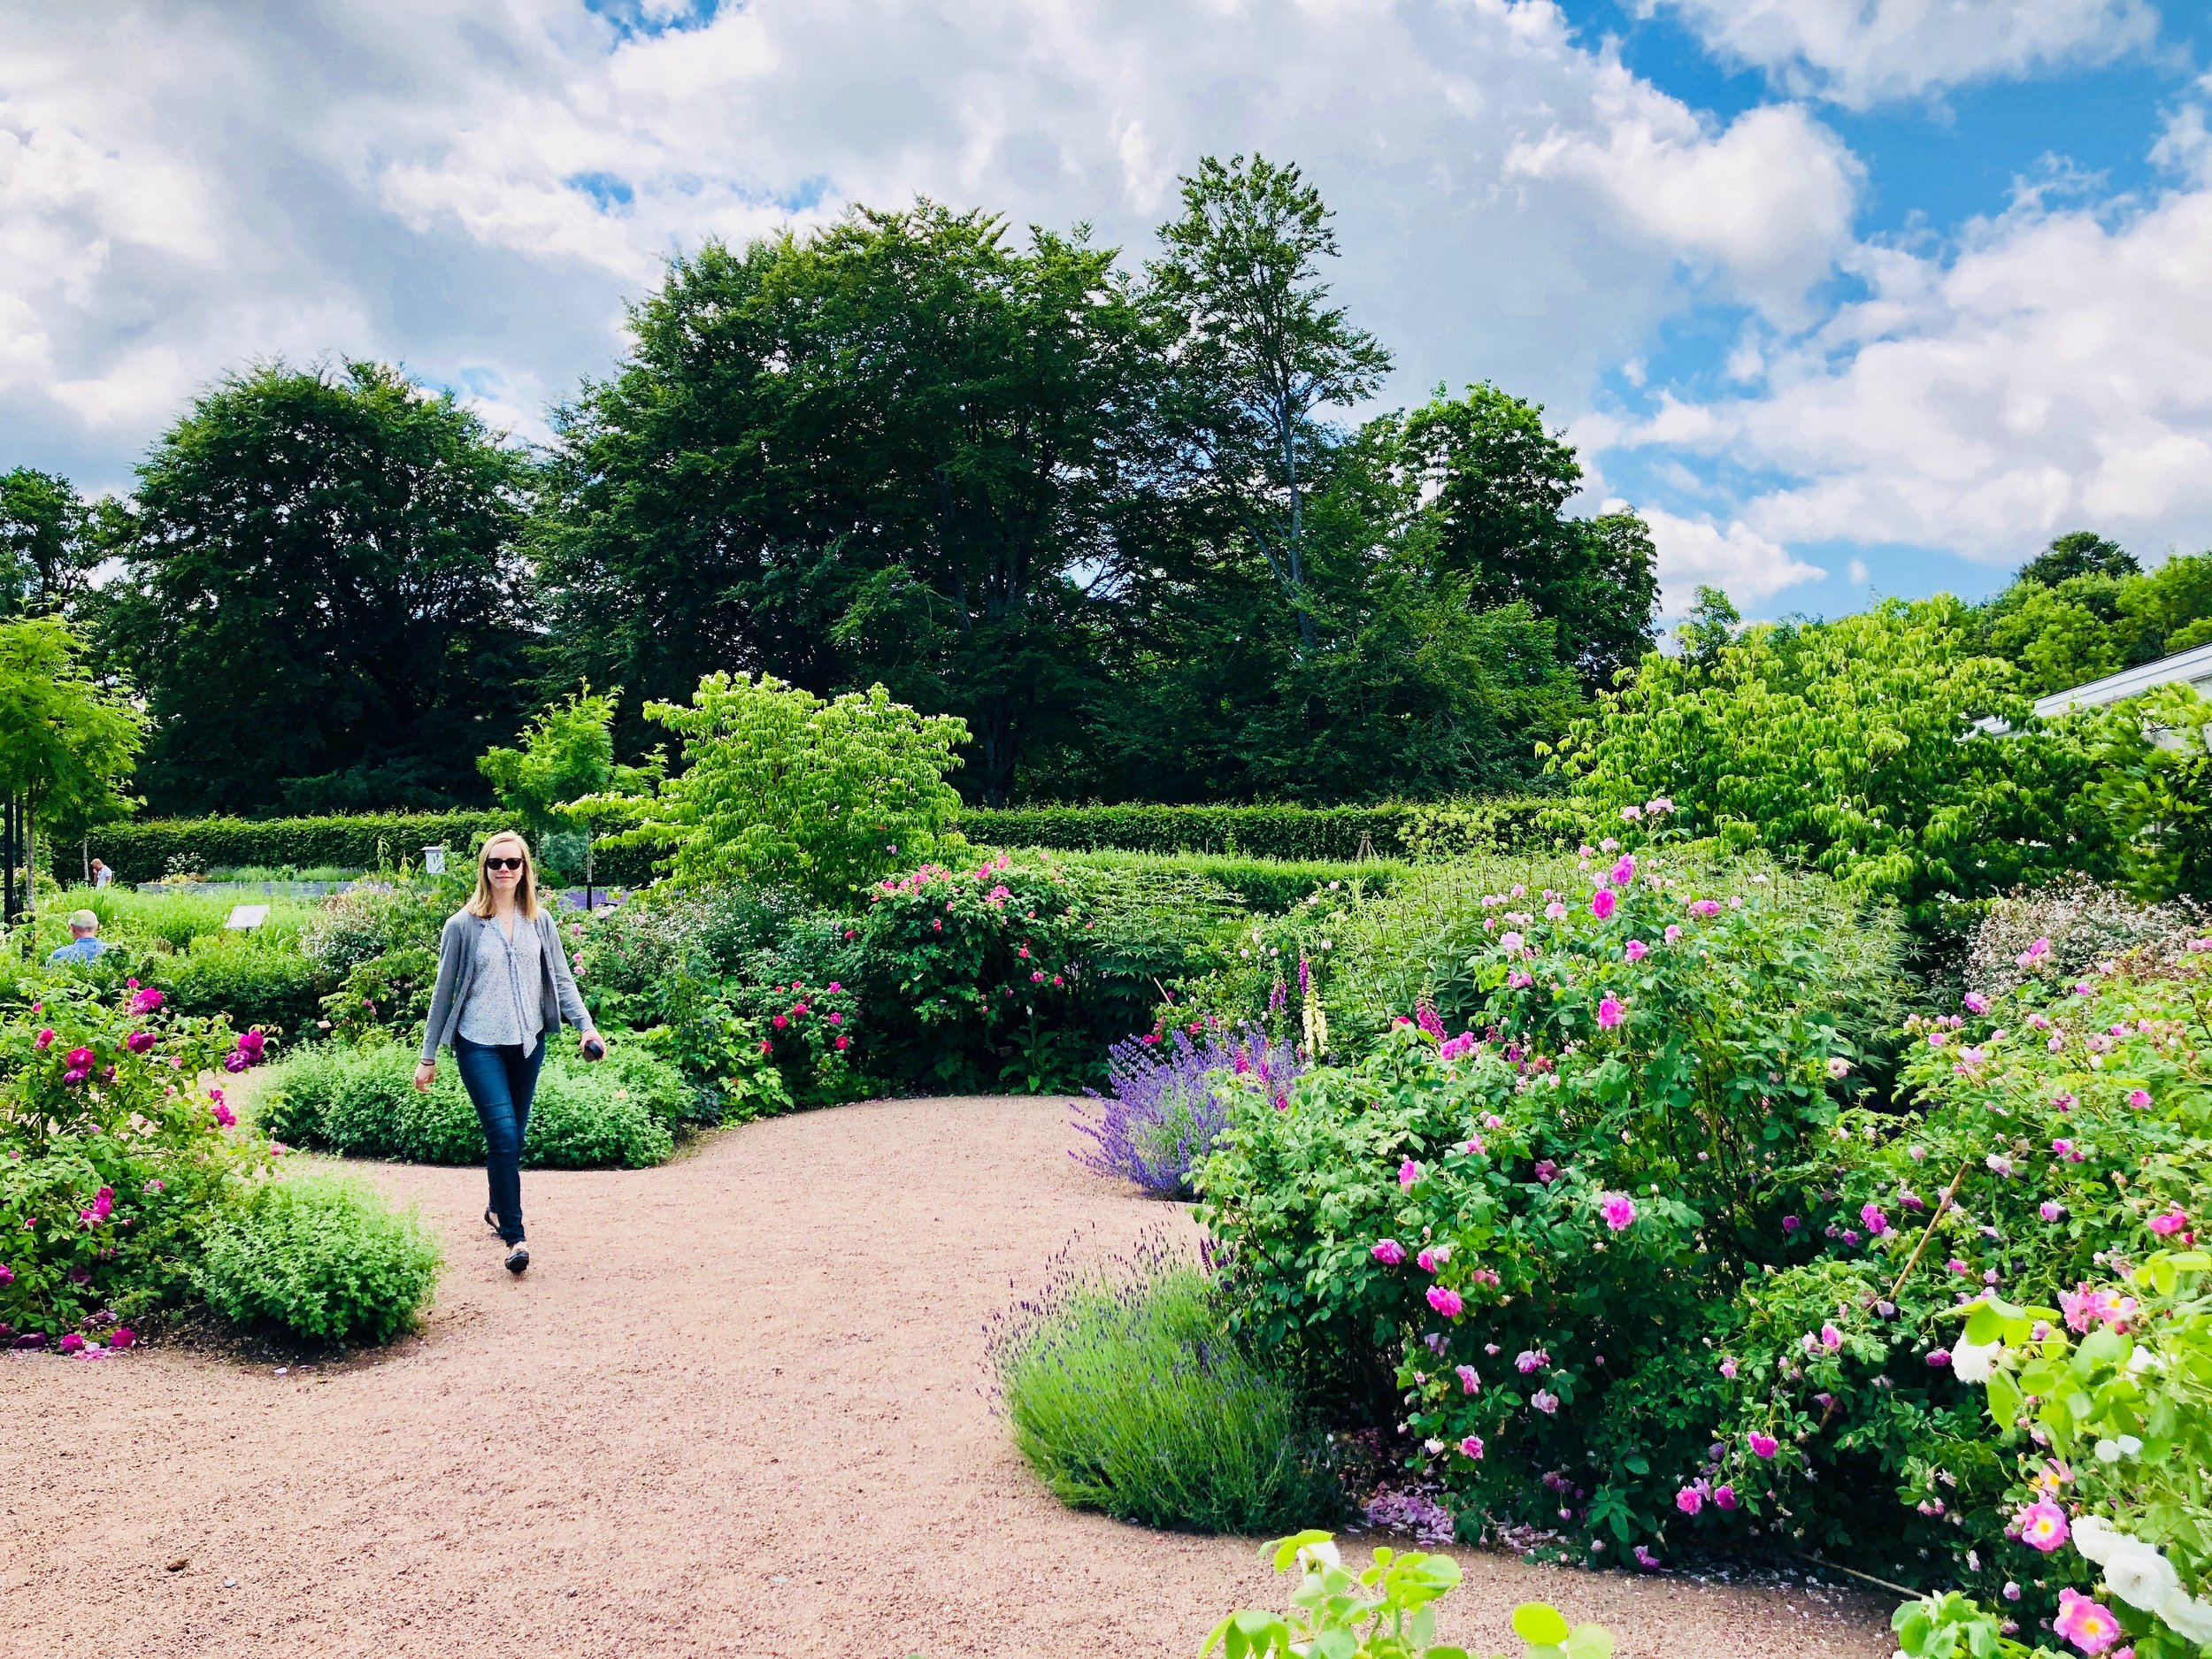 Laura Gullett in the gardens!